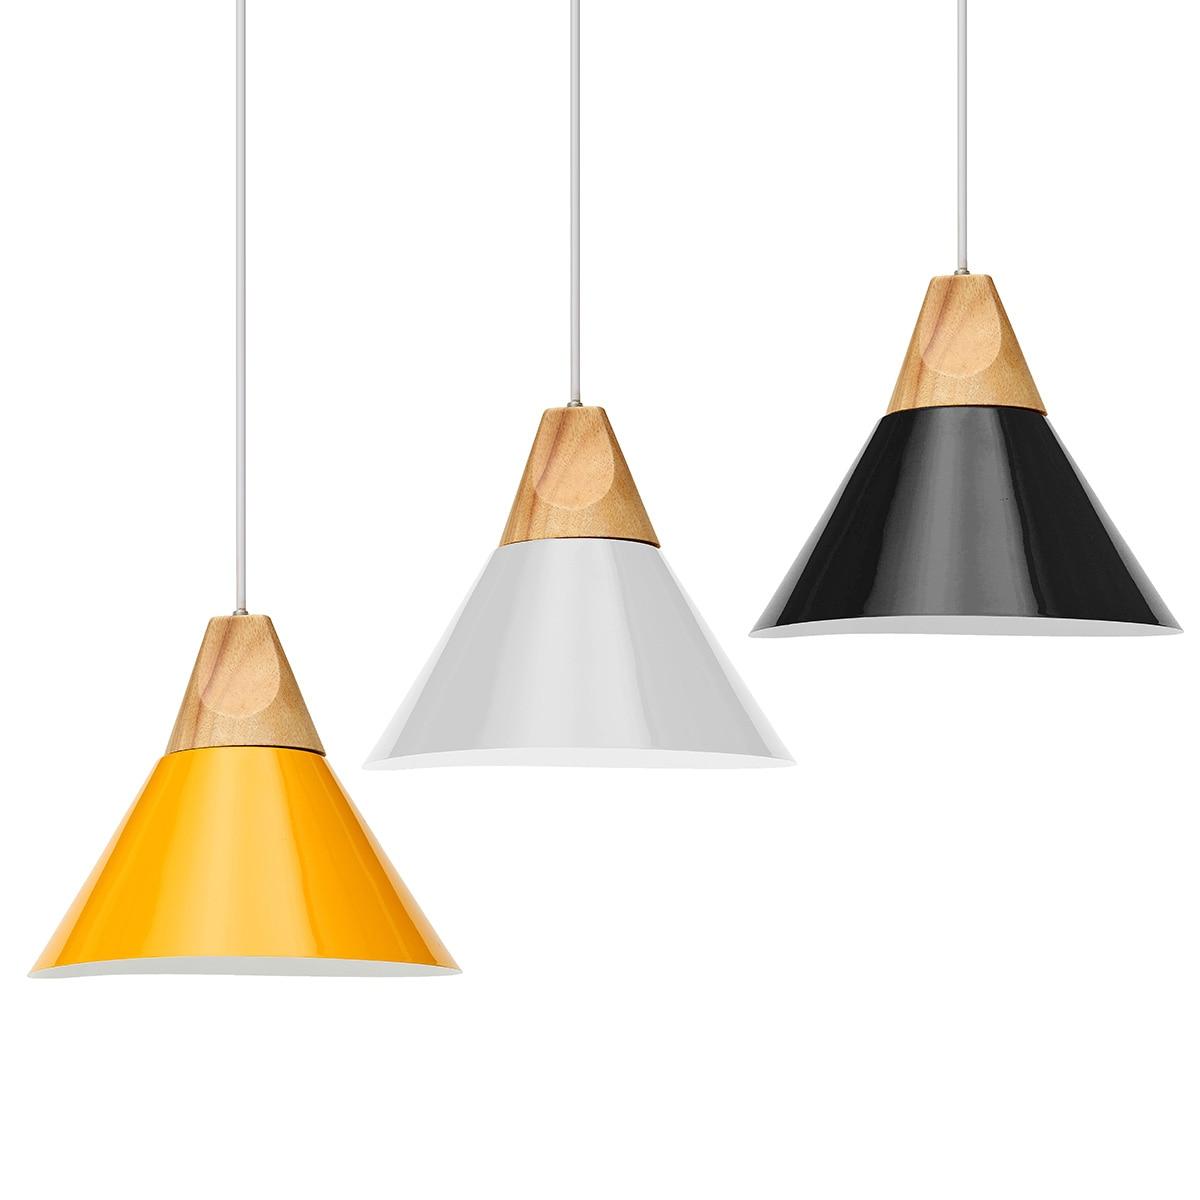 E27 Pendant Lights Led Modern for Dinning Room Wood+Aluminum Suspension Hanging Ceiling Lamp Home Lighting for Kitchen Large